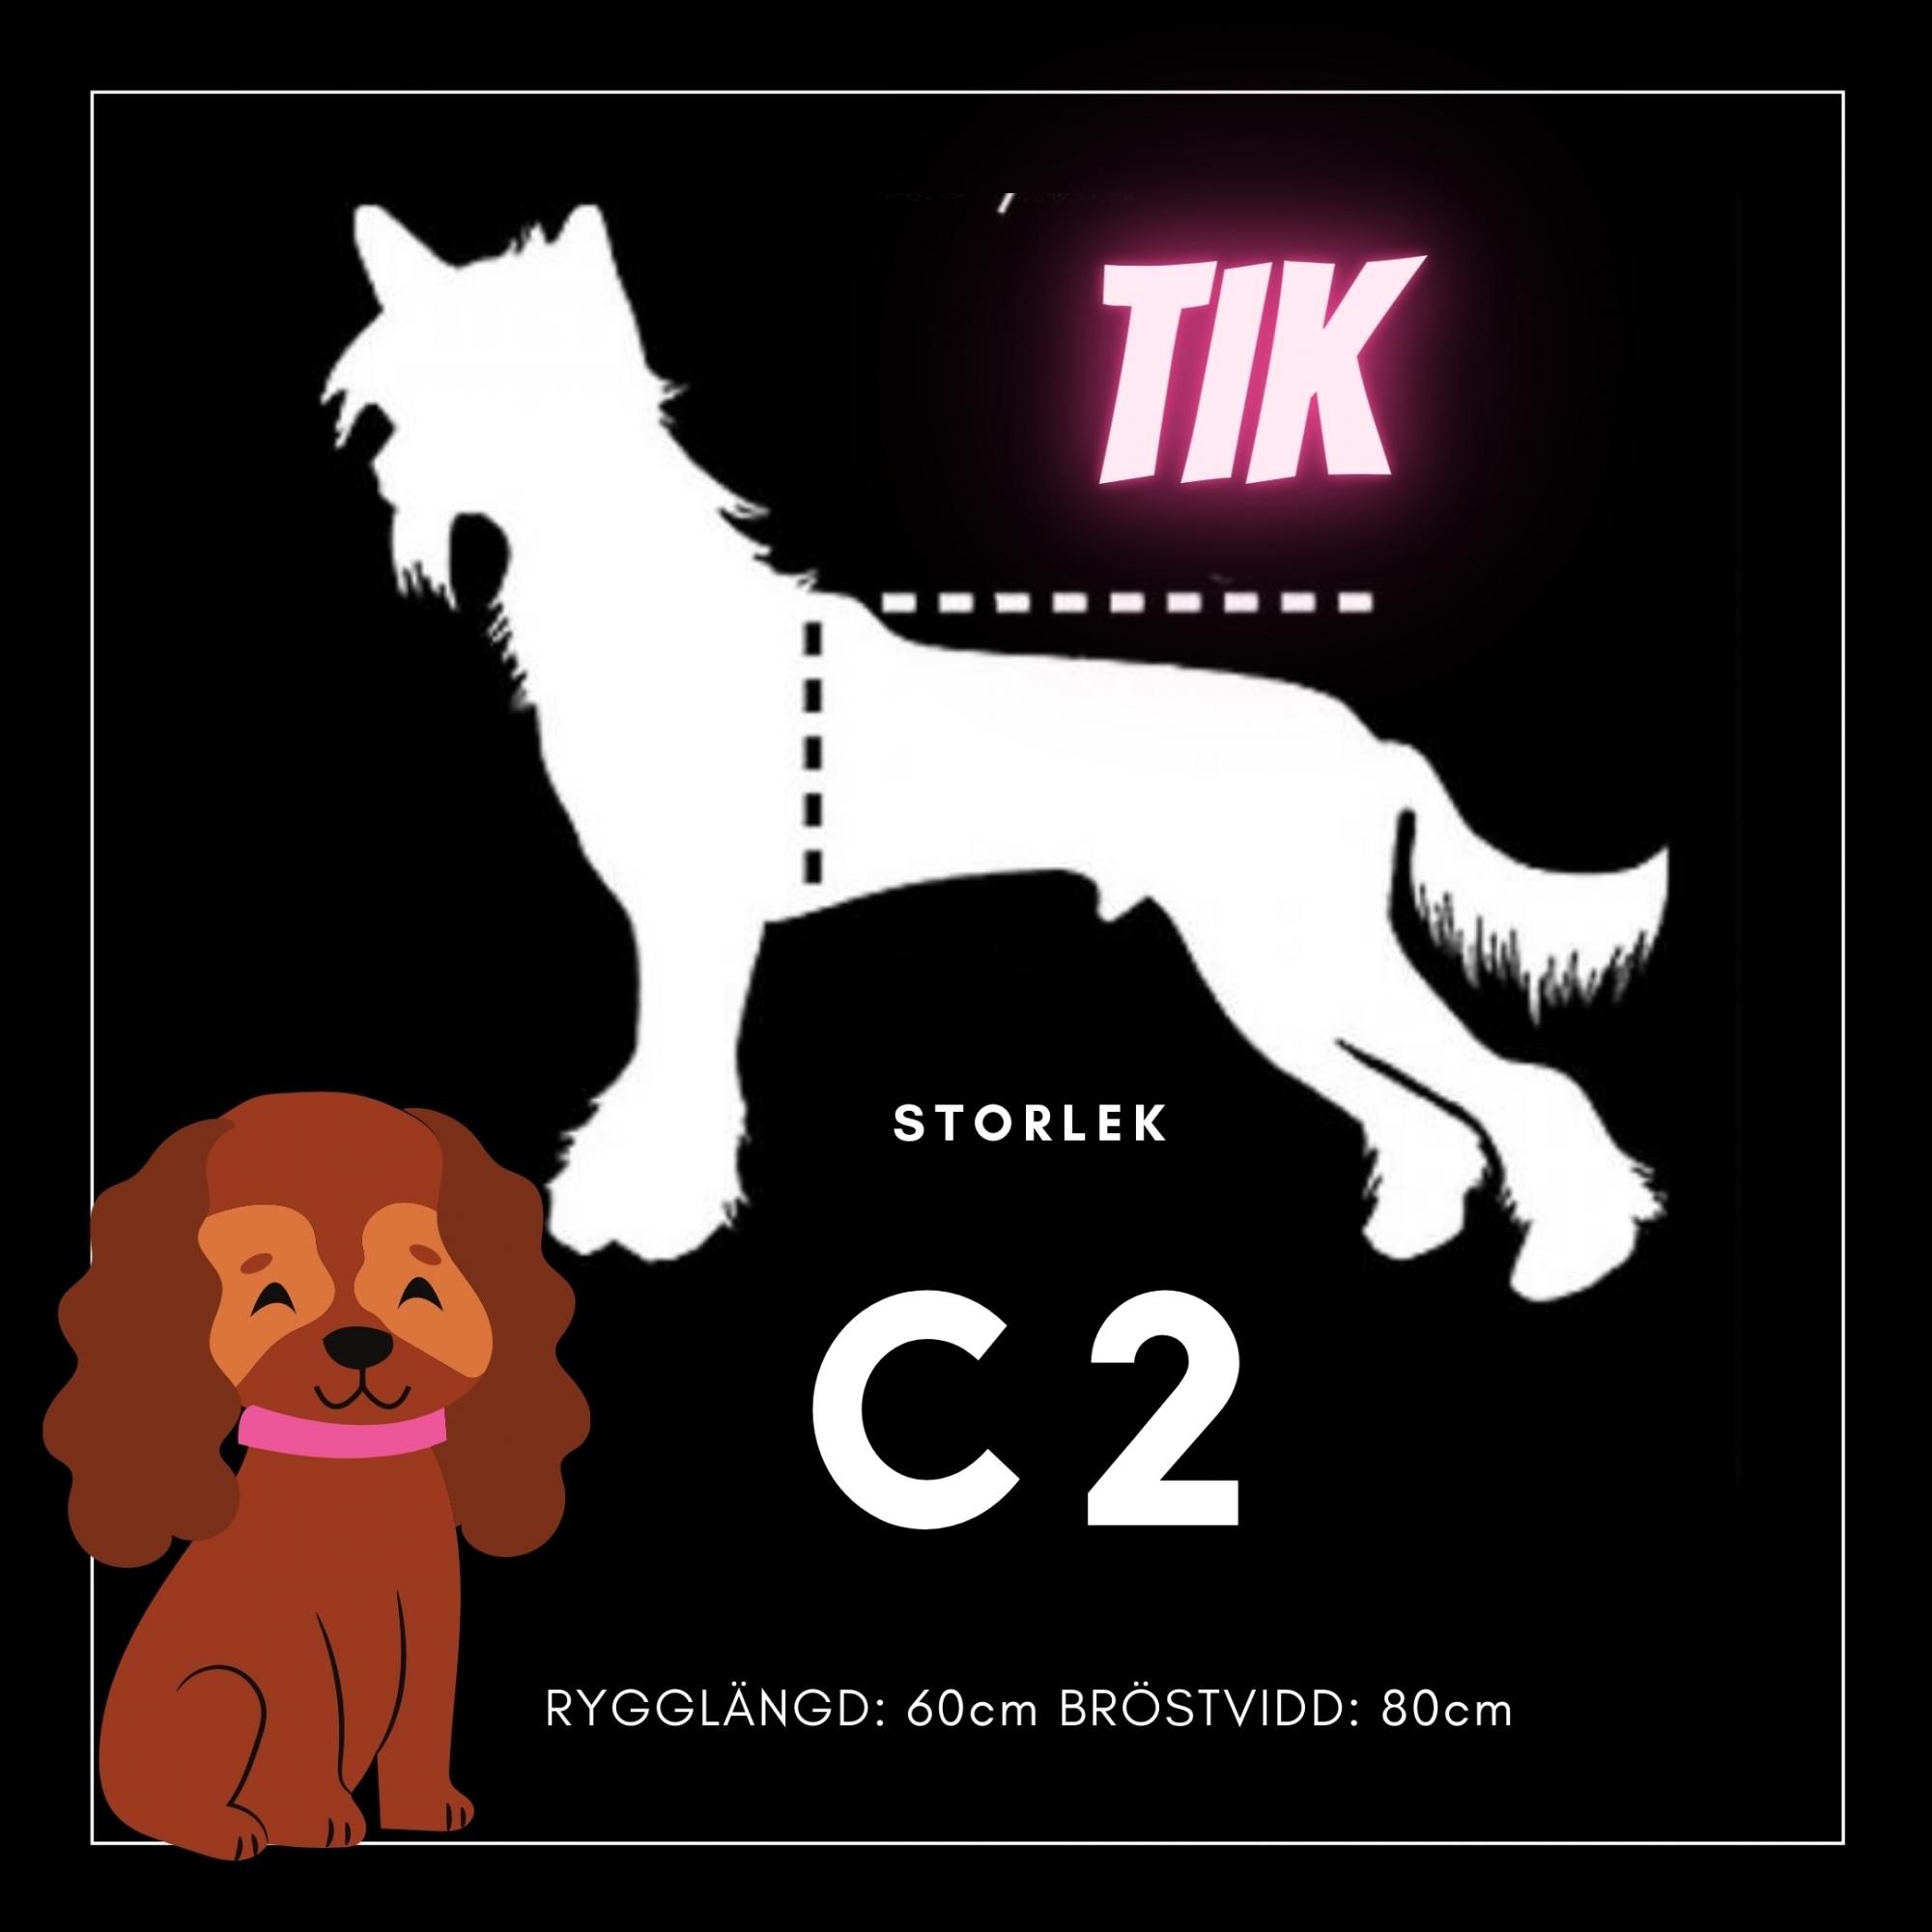 Tik Storlek C2 - Passion For Pet Fashion